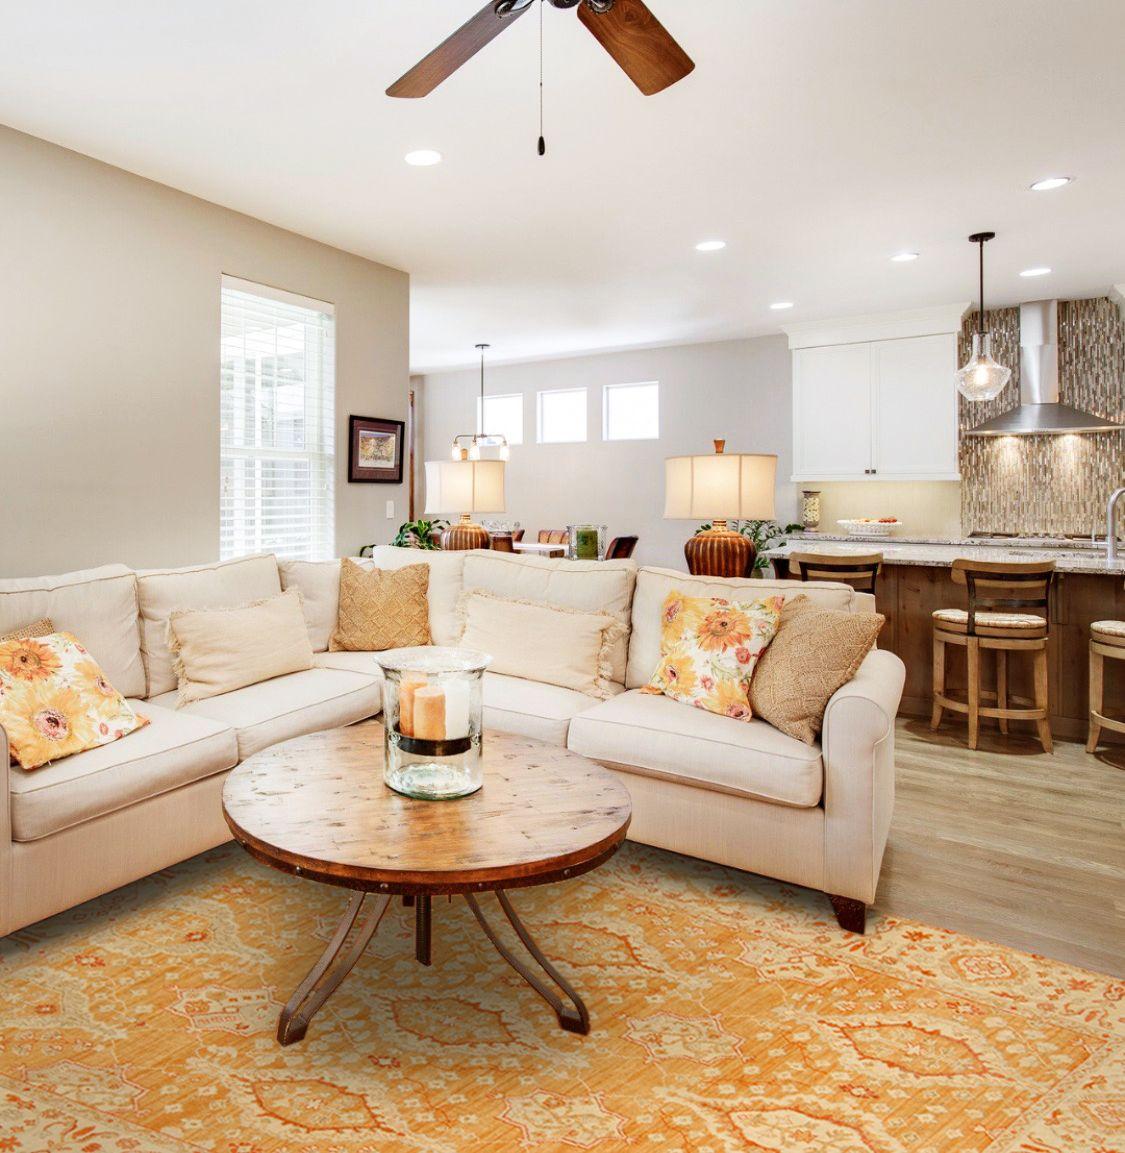 Room Settings View Quality Samad Rugs Samad Orange Rugs Modern Rugs Room #persian #rug #modern #living #room